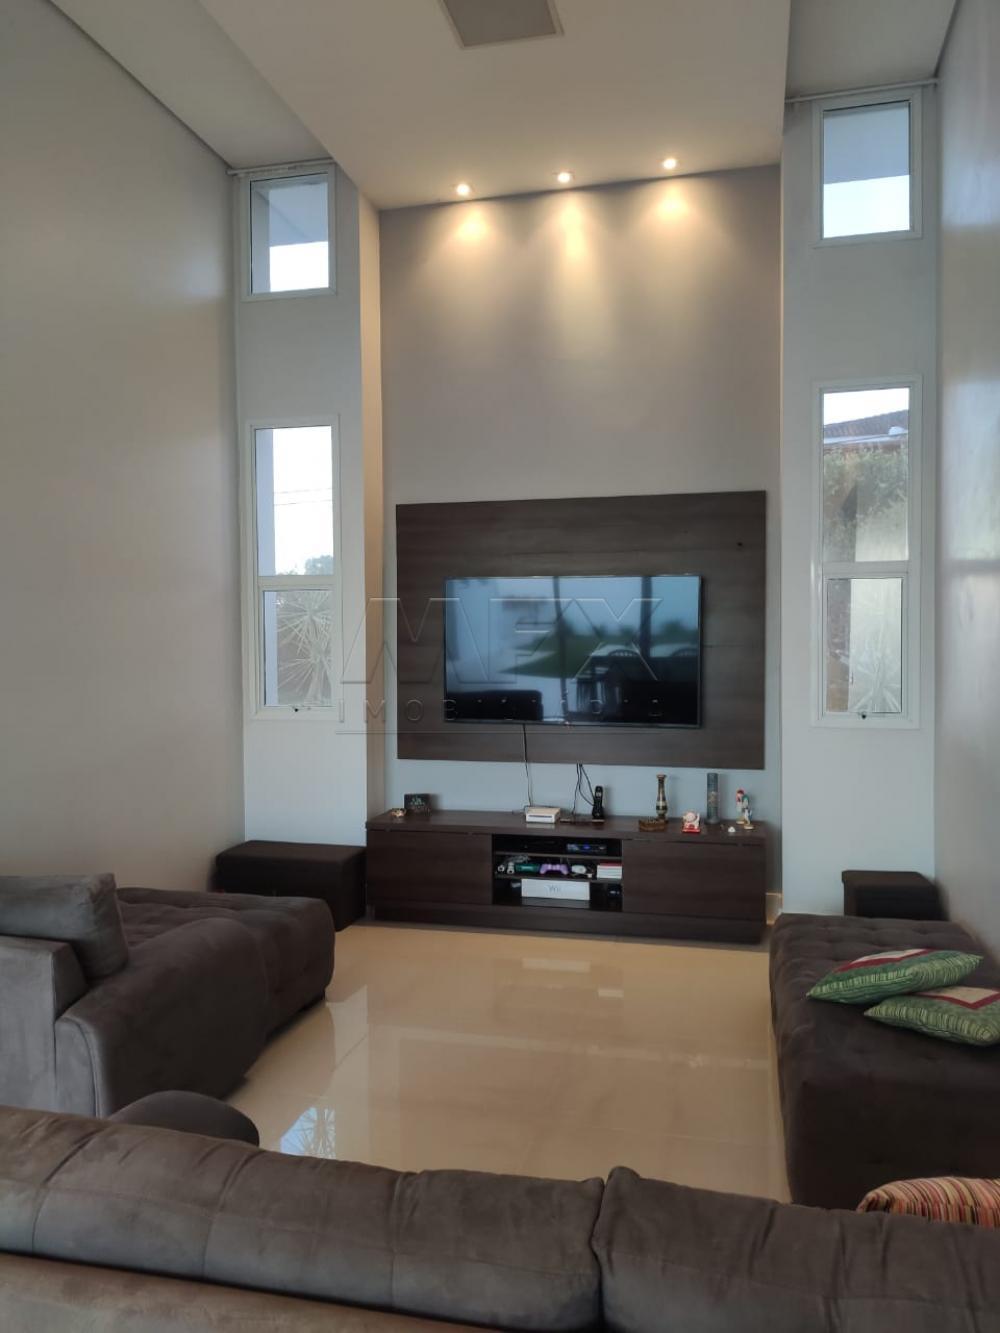 Comprar Casa / Condomínio em Bauru apenas R$ 1.800.000,00 - Foto 13